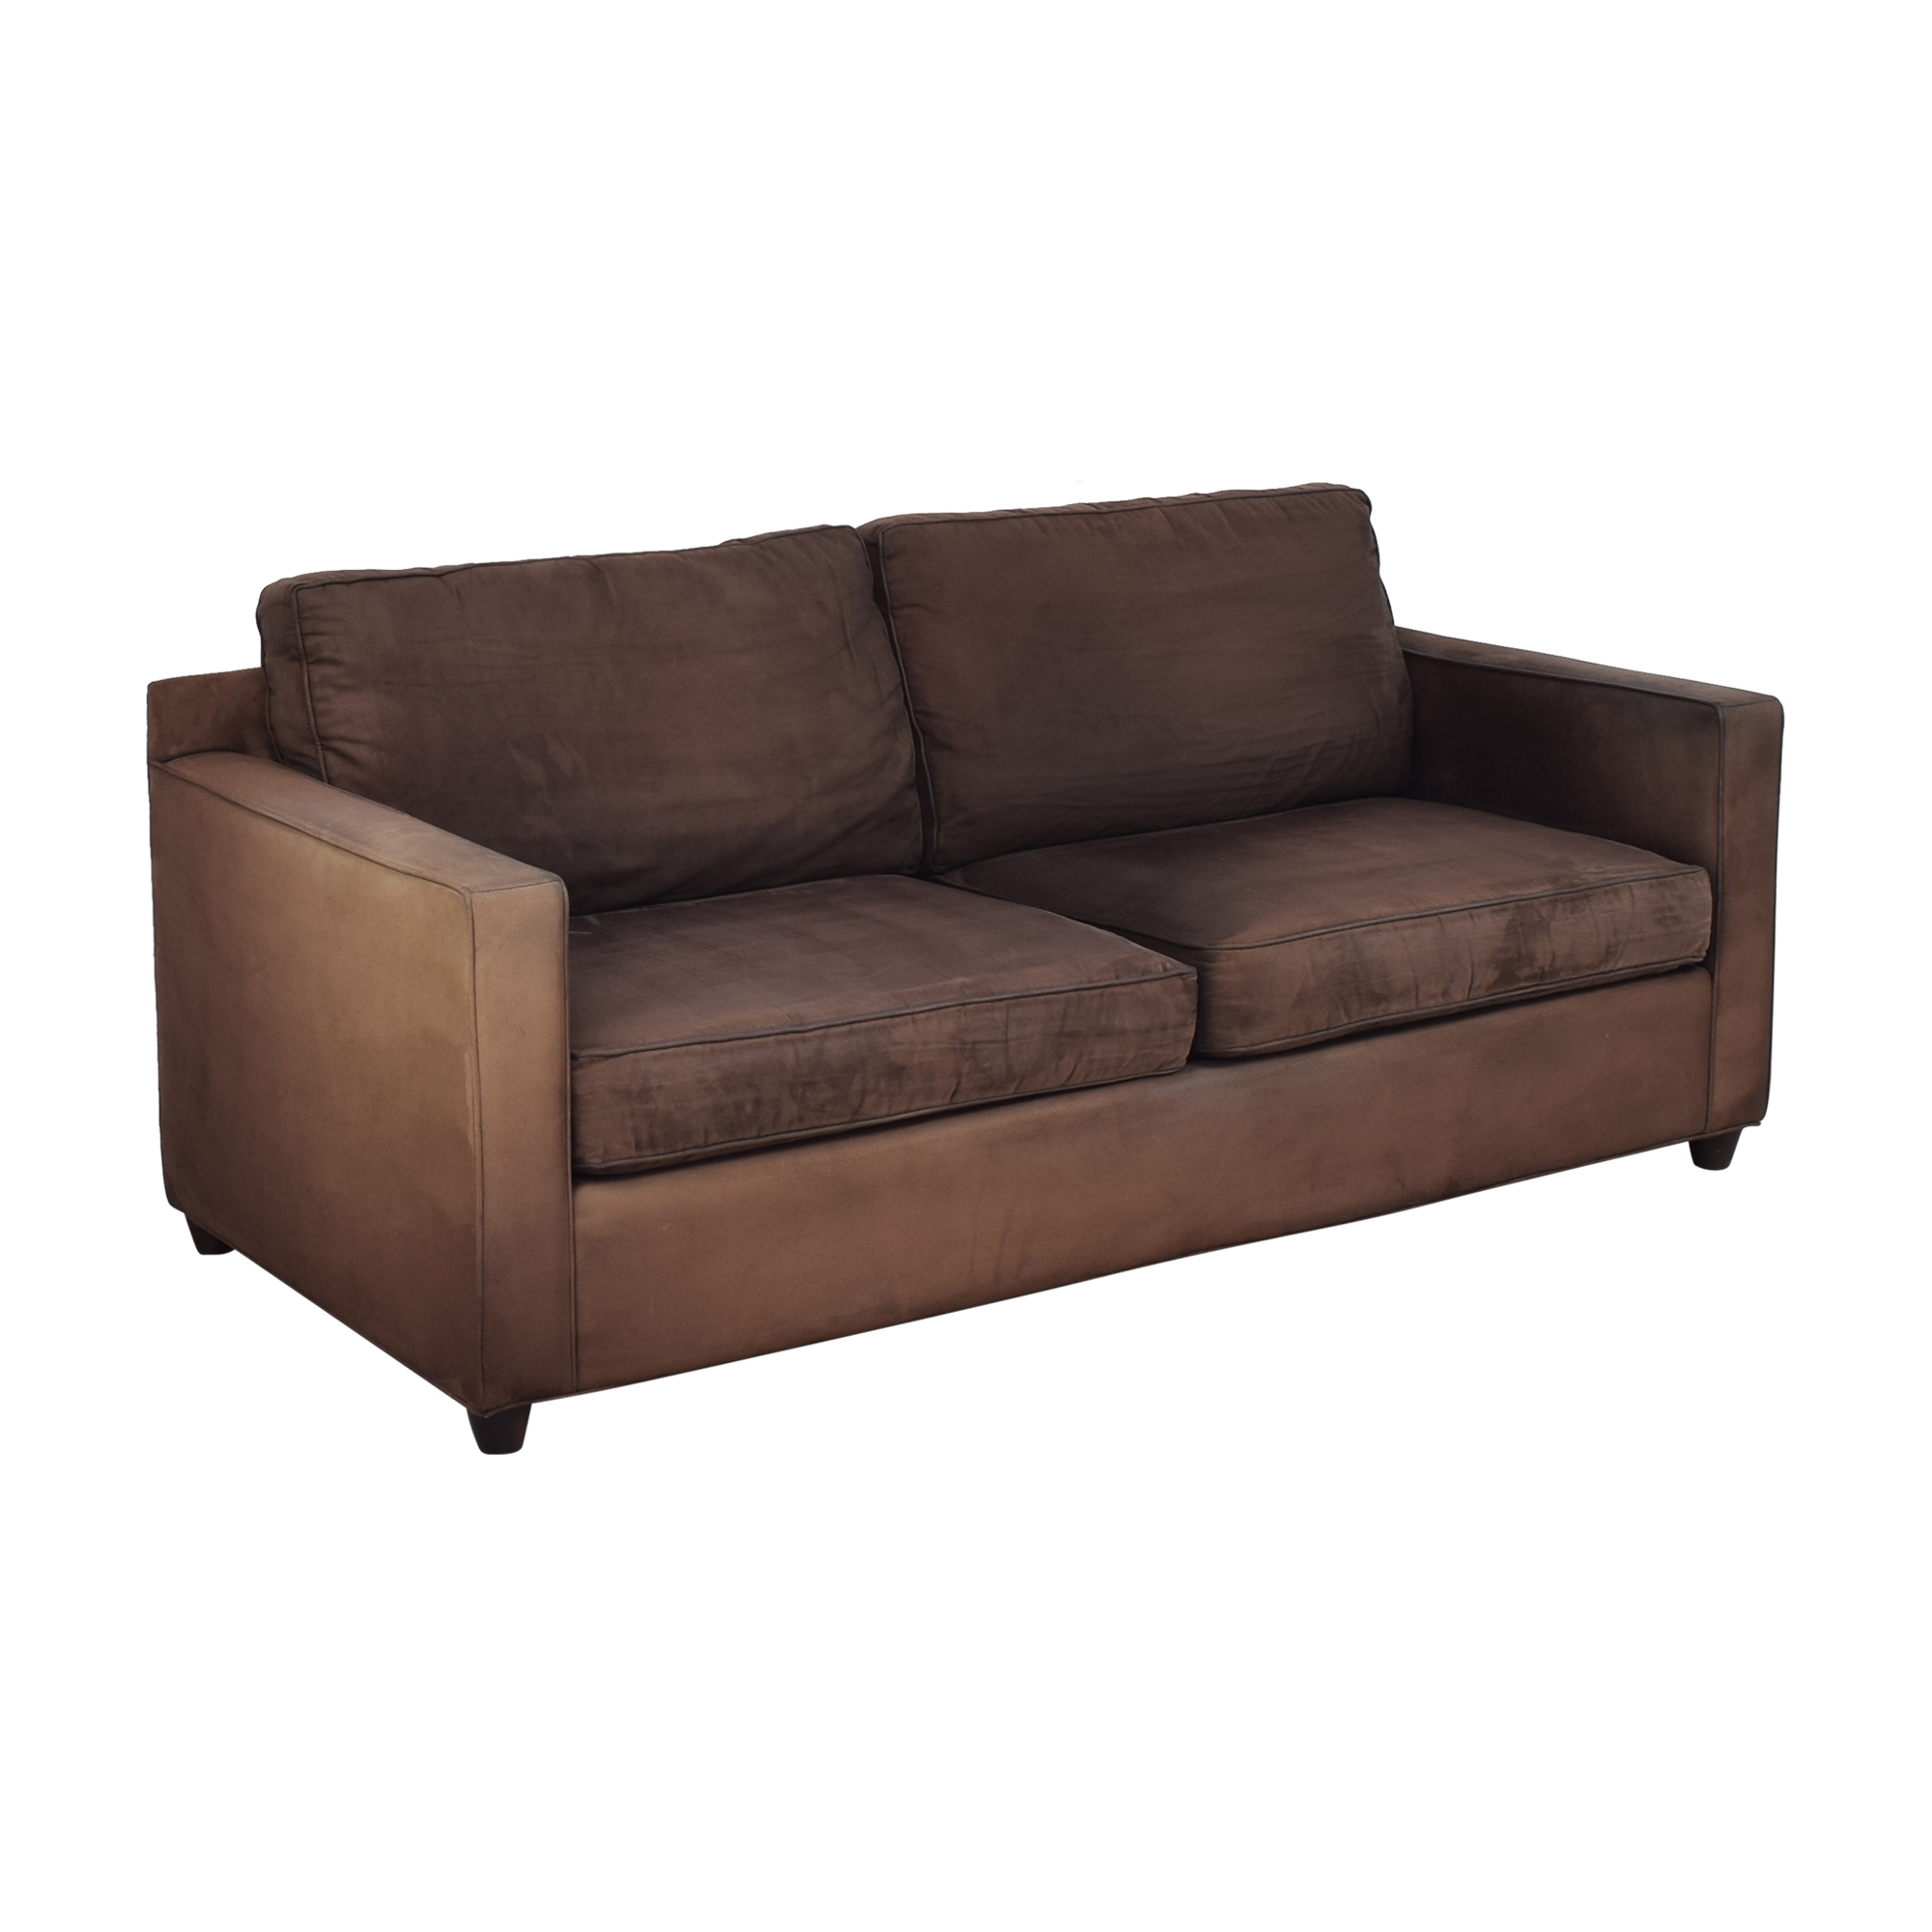 Crate & Barrel Barrett Two Cushion Sofa / Sofas